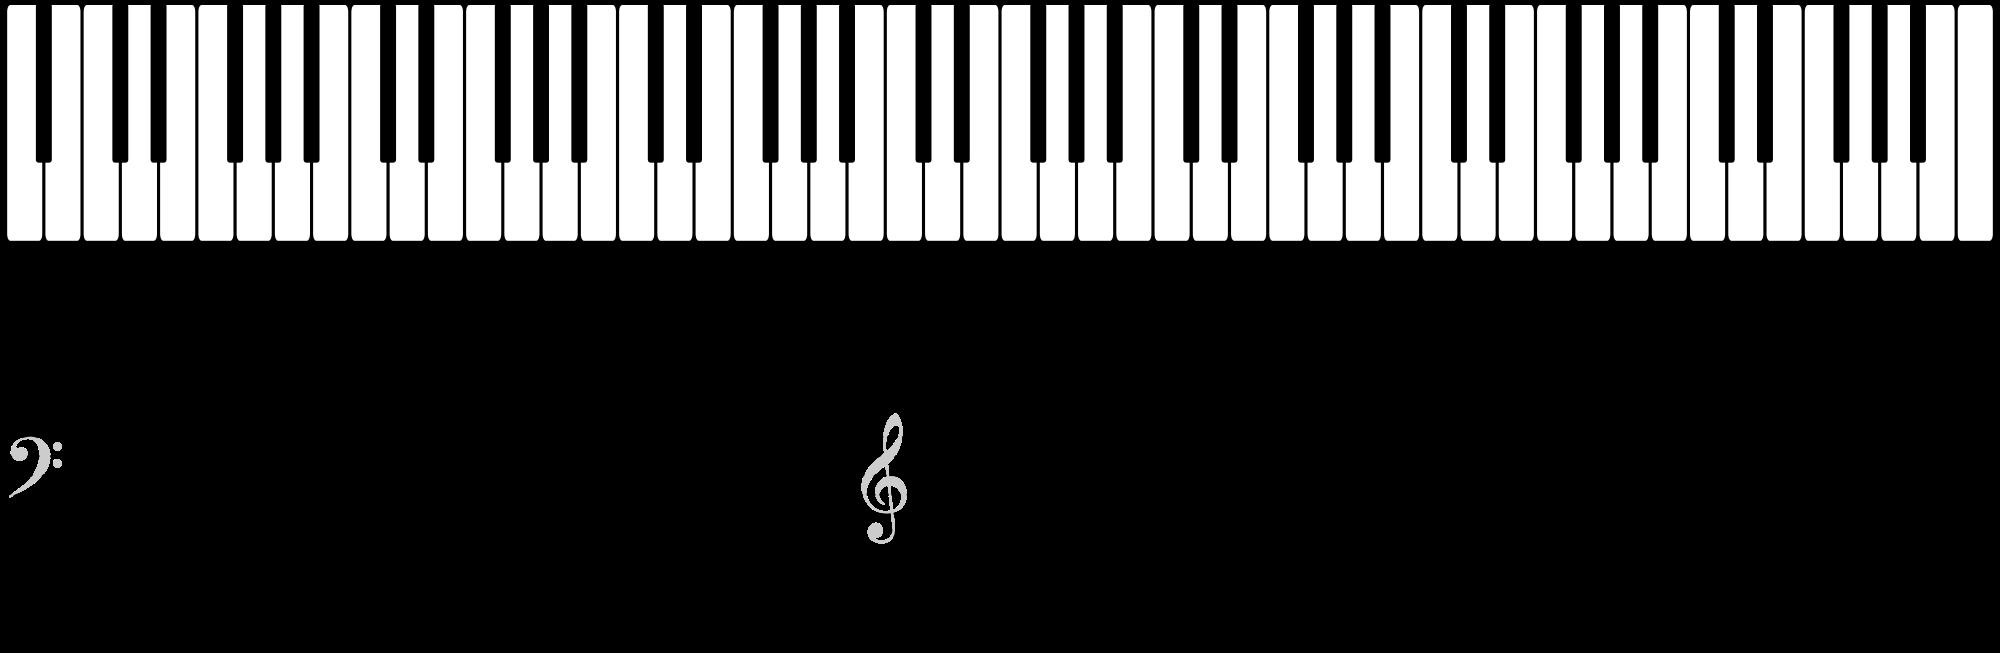 Piano clipart keyboard casio. Notes chart romeo landinez